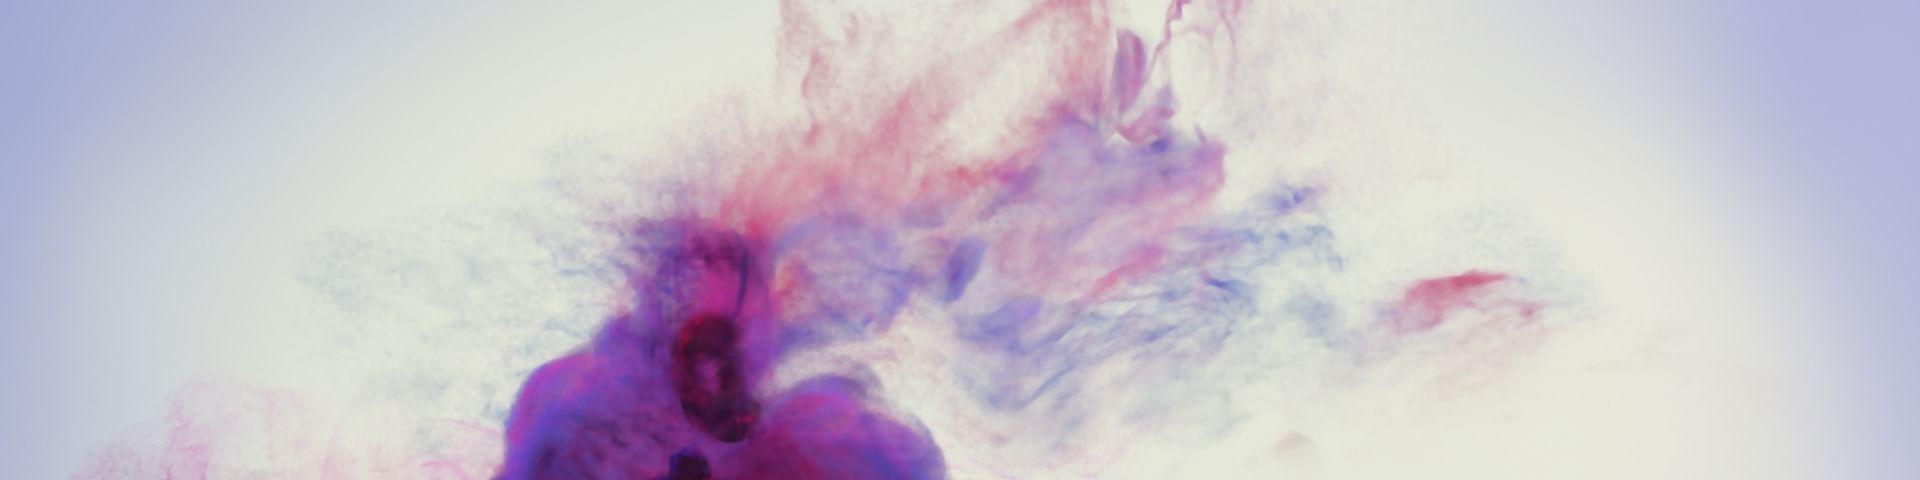 Martin Scorsese et Cannes